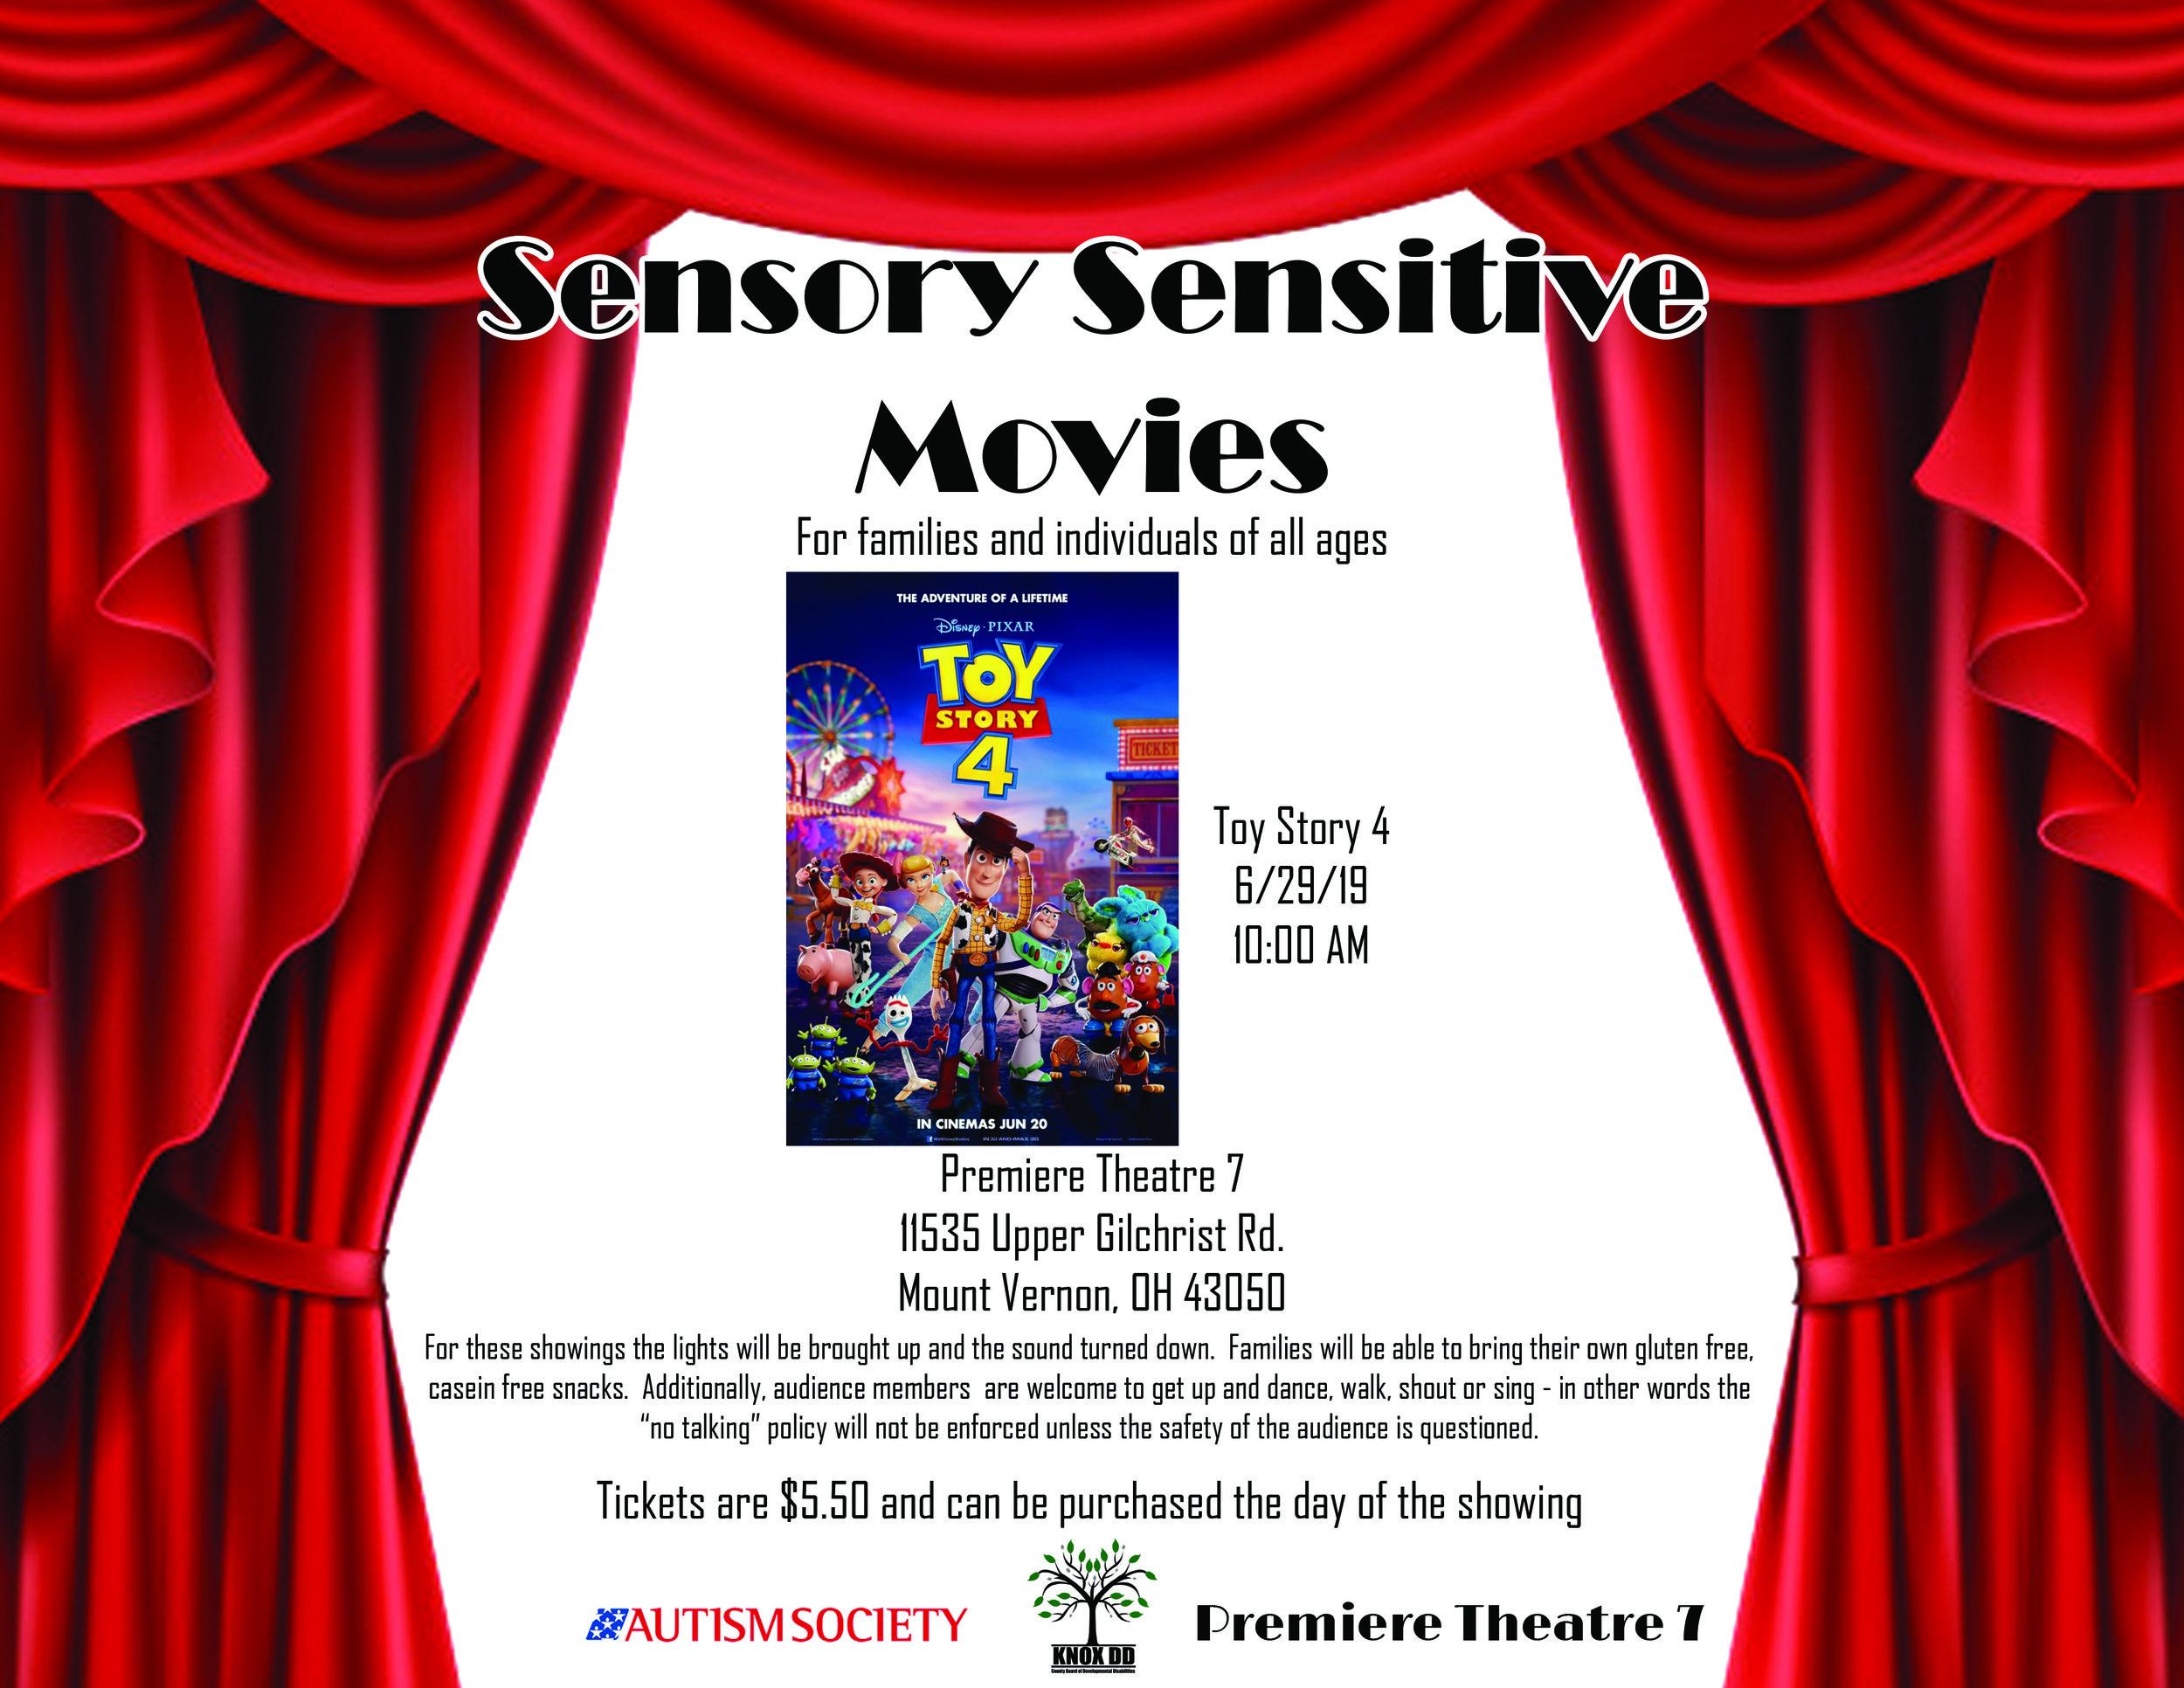 toy story Sensory Sensitive Movies.jpg